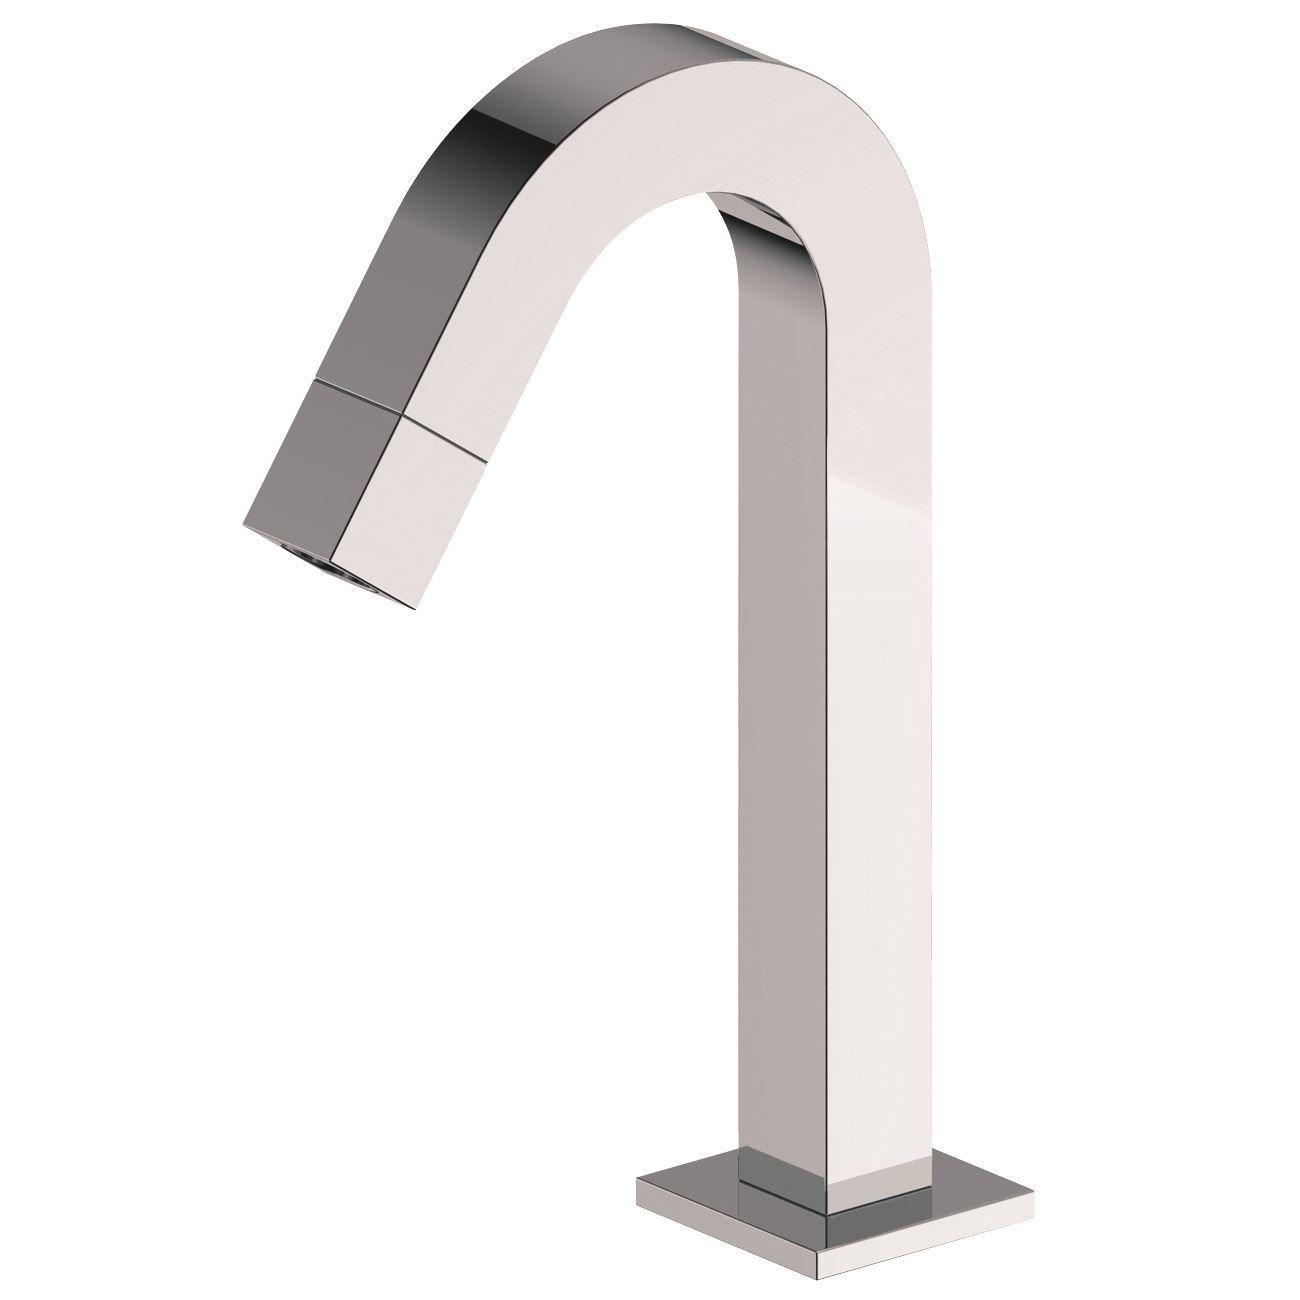 Mueller Kappa toiletkraan staand gebogen chroom